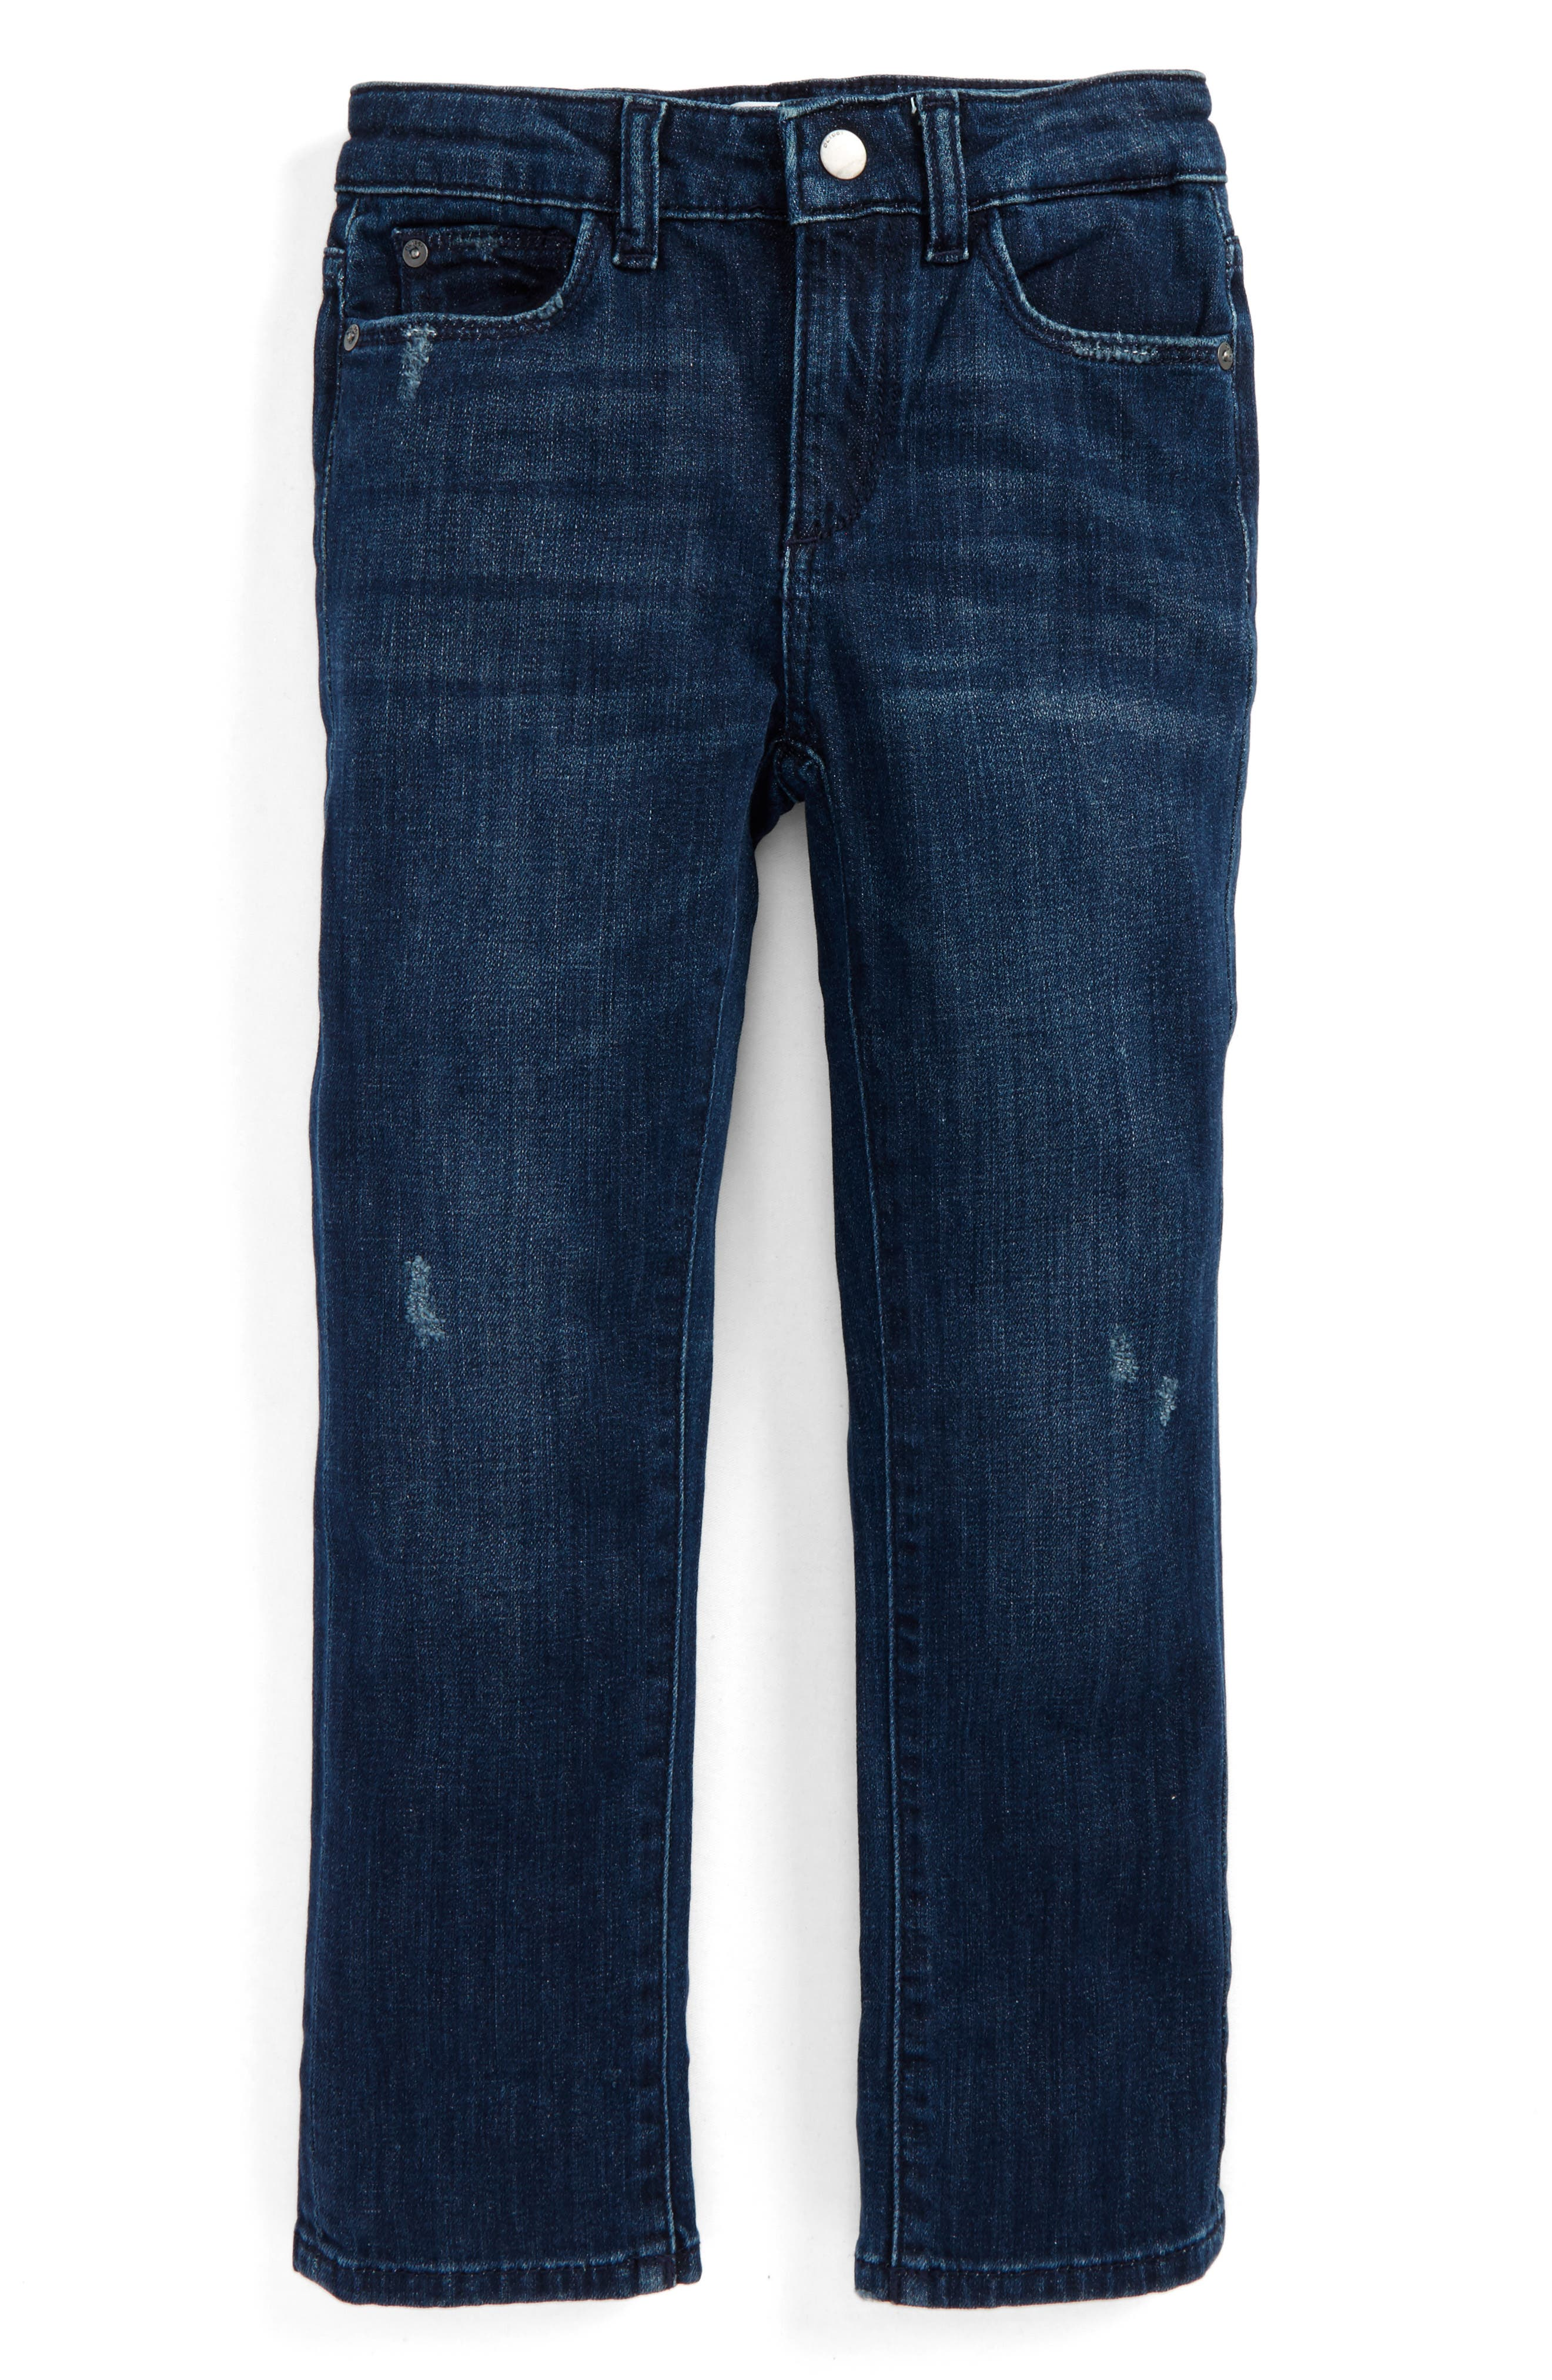 Alternate Image 1 Selected - DL1961 Brady Slim Fit Jeans (Toddler Boys & Little Boys)